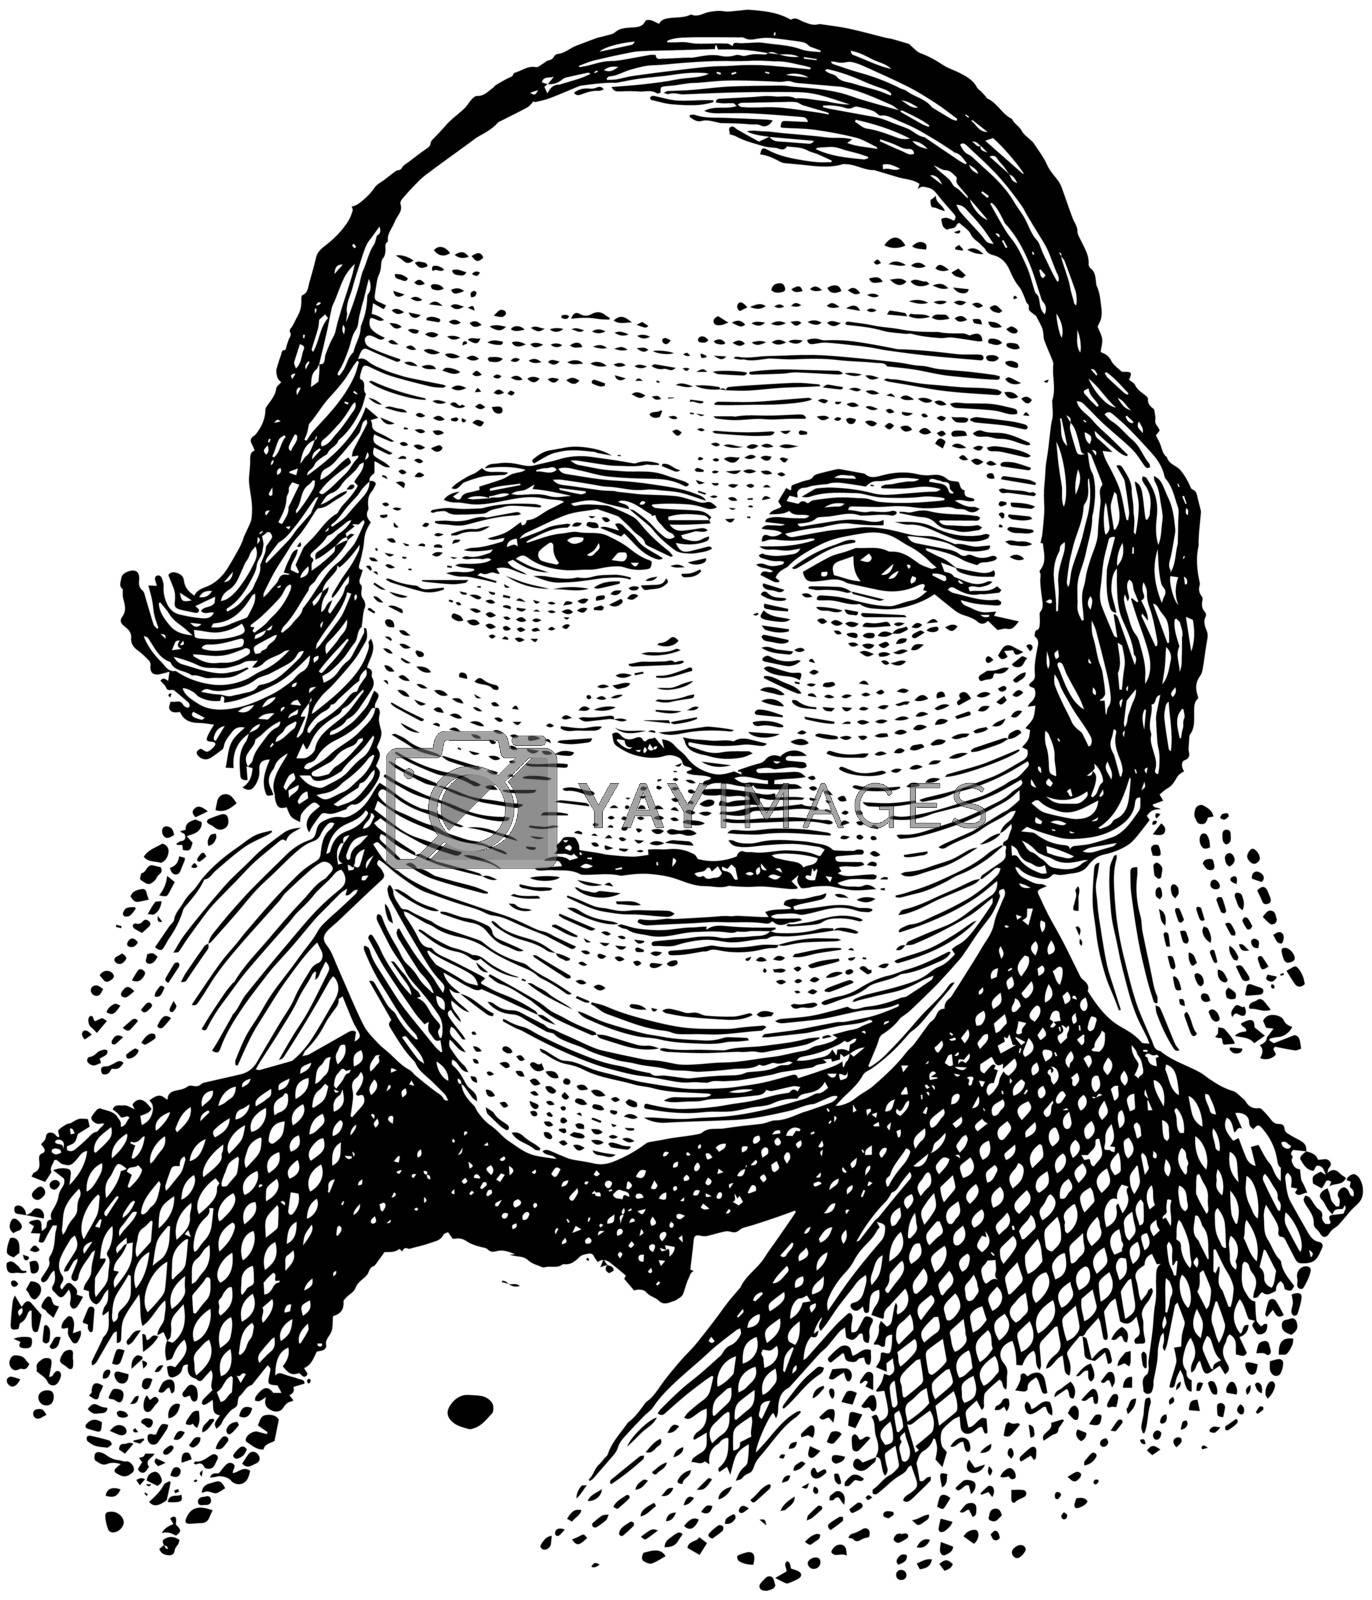 Louis Agassiz, vintage illustration by Morphart